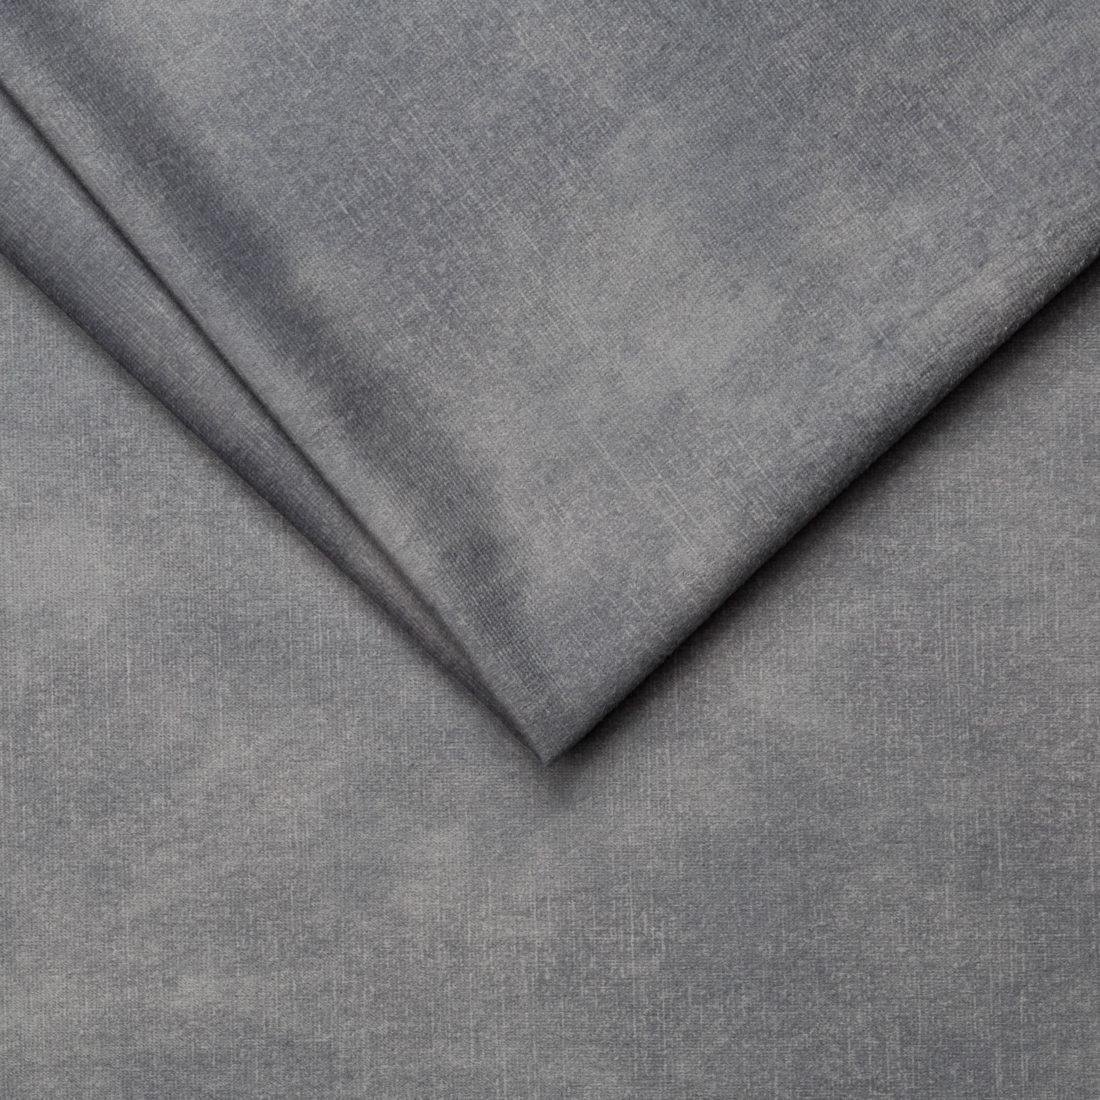 Мебельная ткань Palladium 15 Moon Mist, велюр